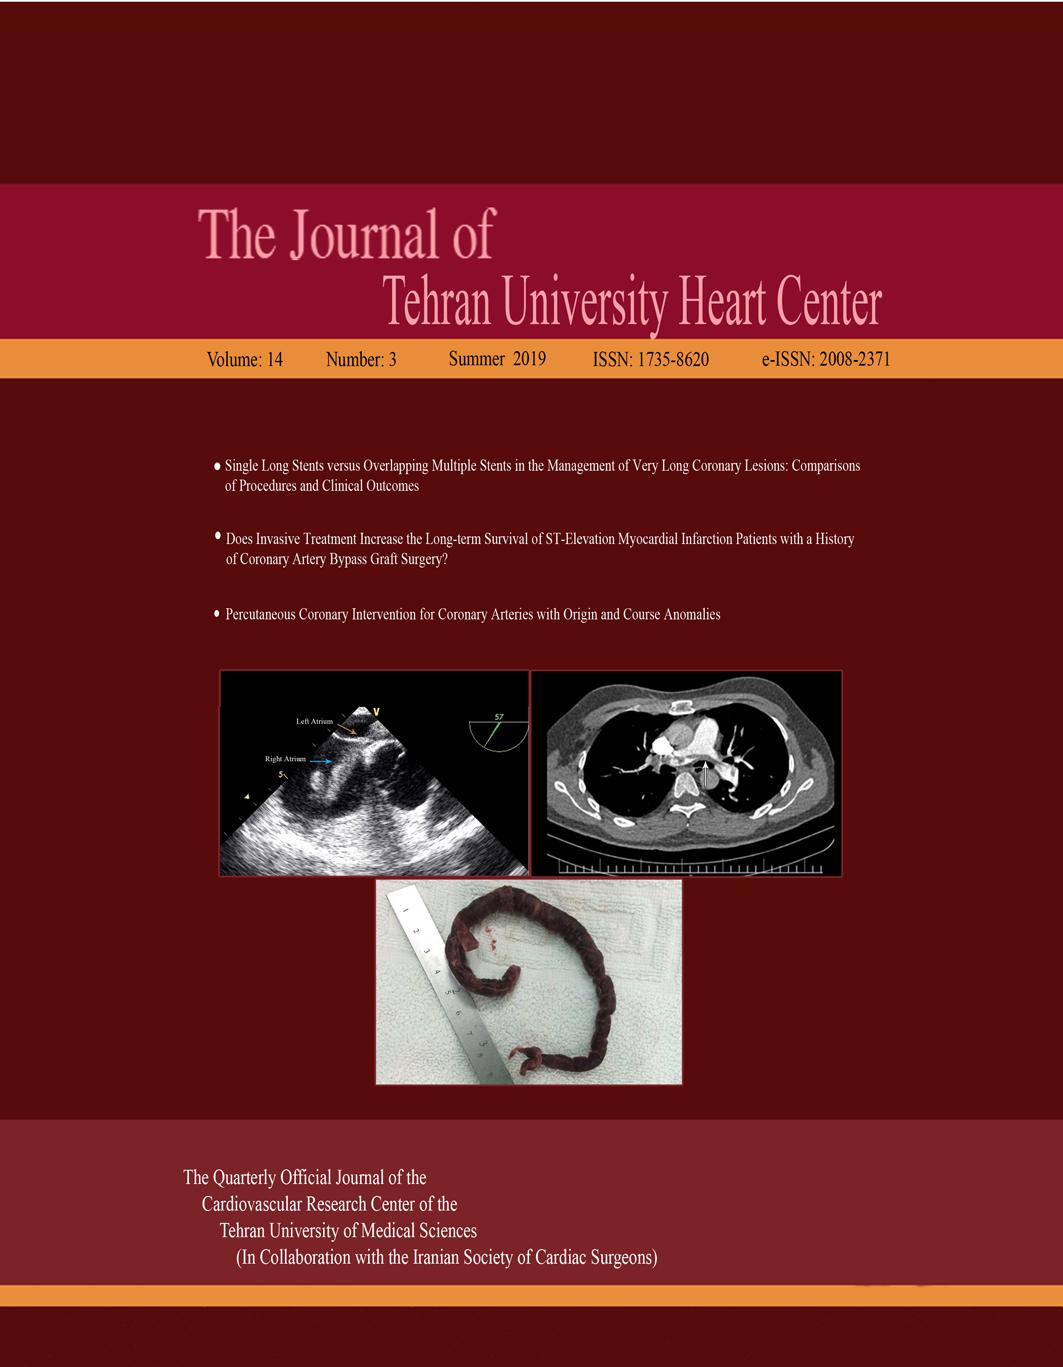 The Journal of Tehran University Heart Center